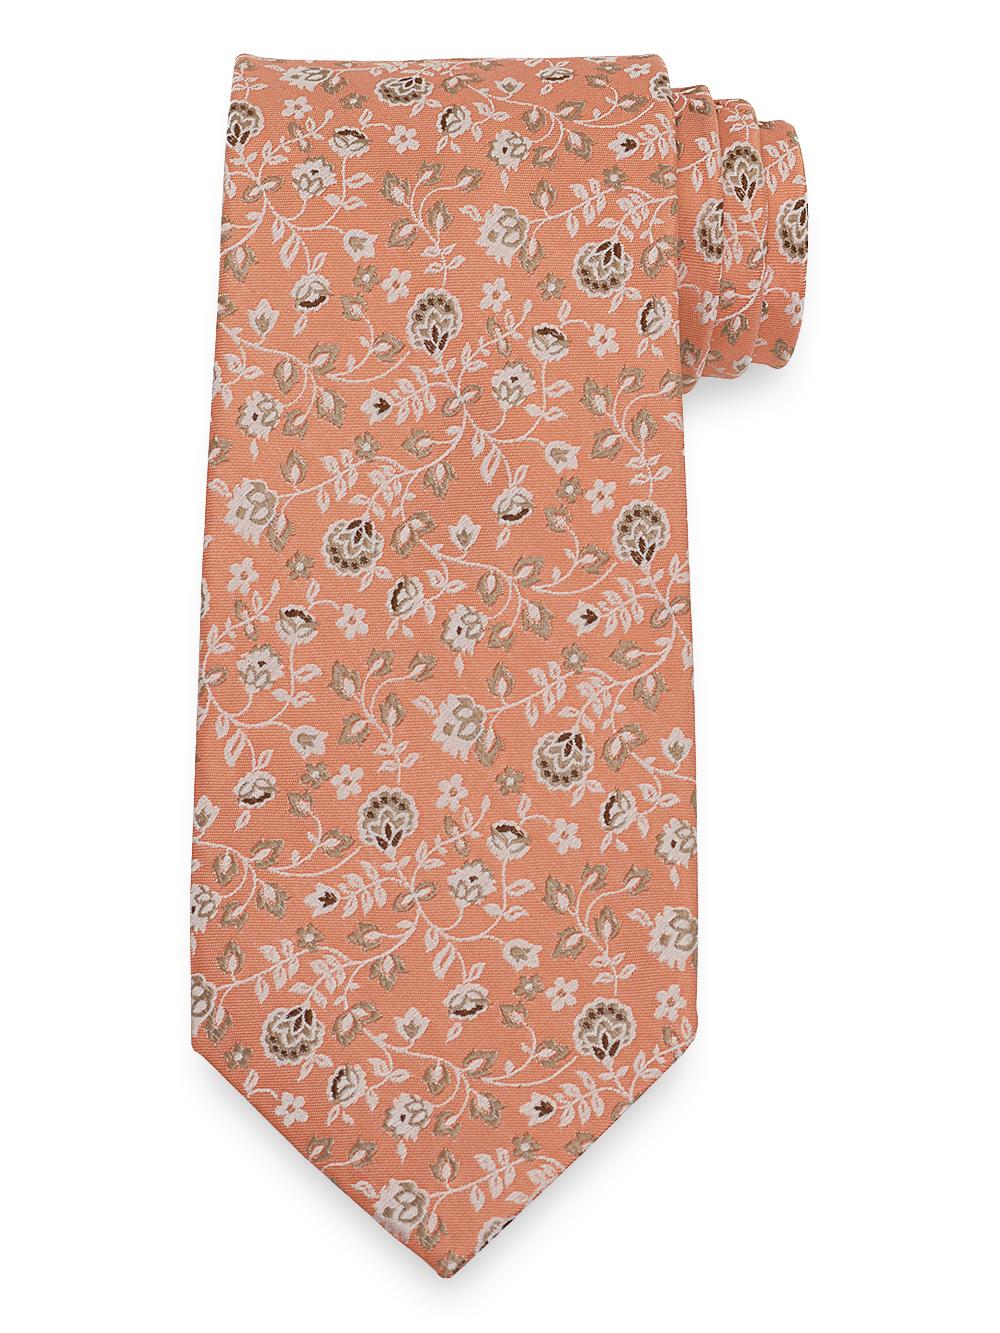 Floral Tie supplier